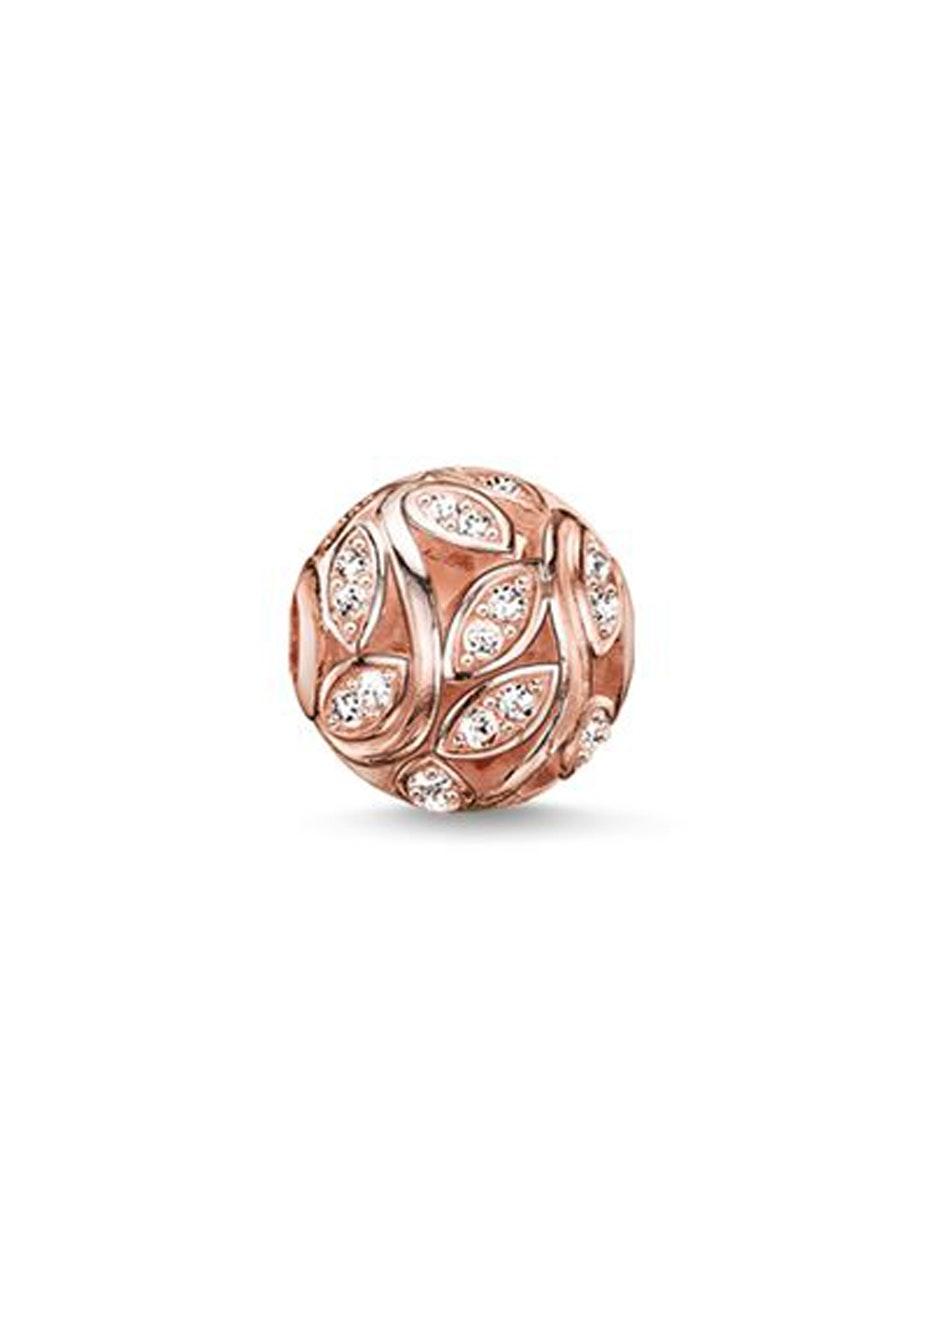 Thomas Sabo  - Karma Bead - Rose Gold Plated Twines Cz Karma